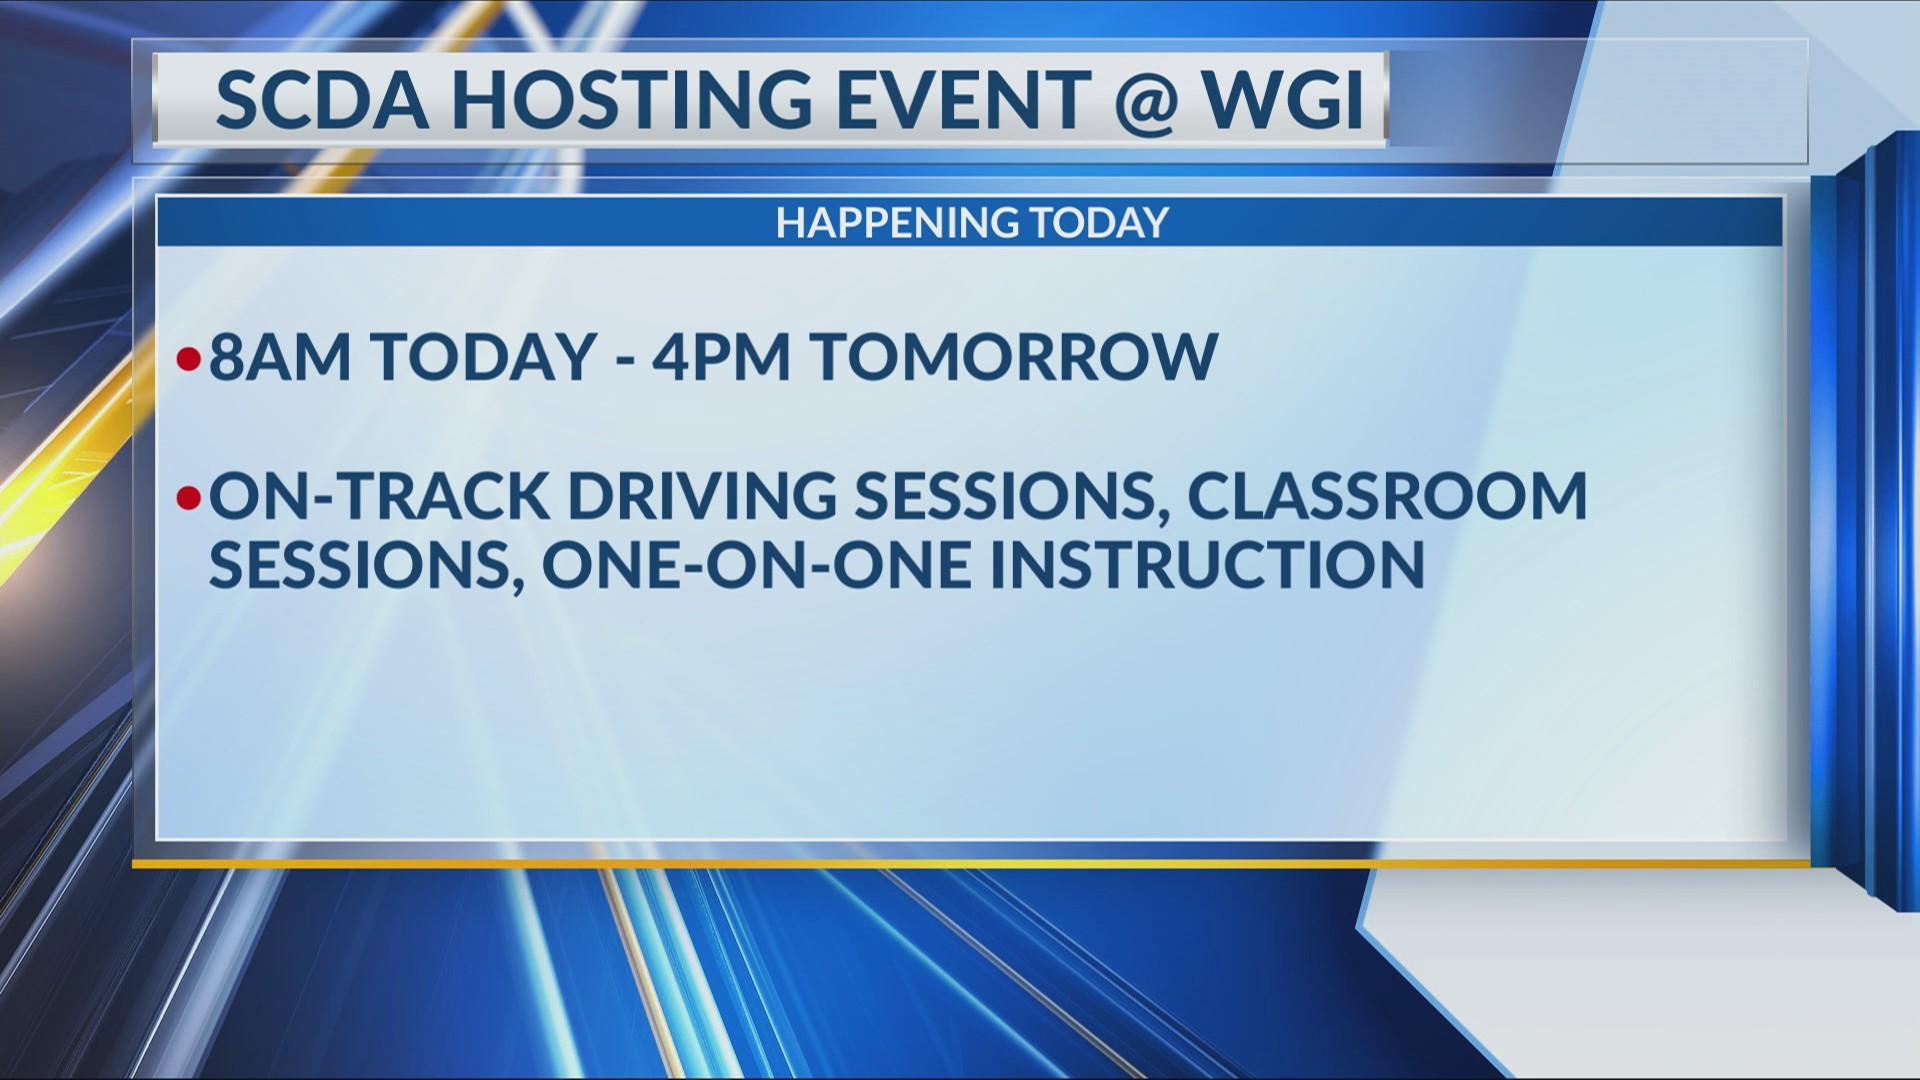 Sports Car Driving Association hosting event at WGI